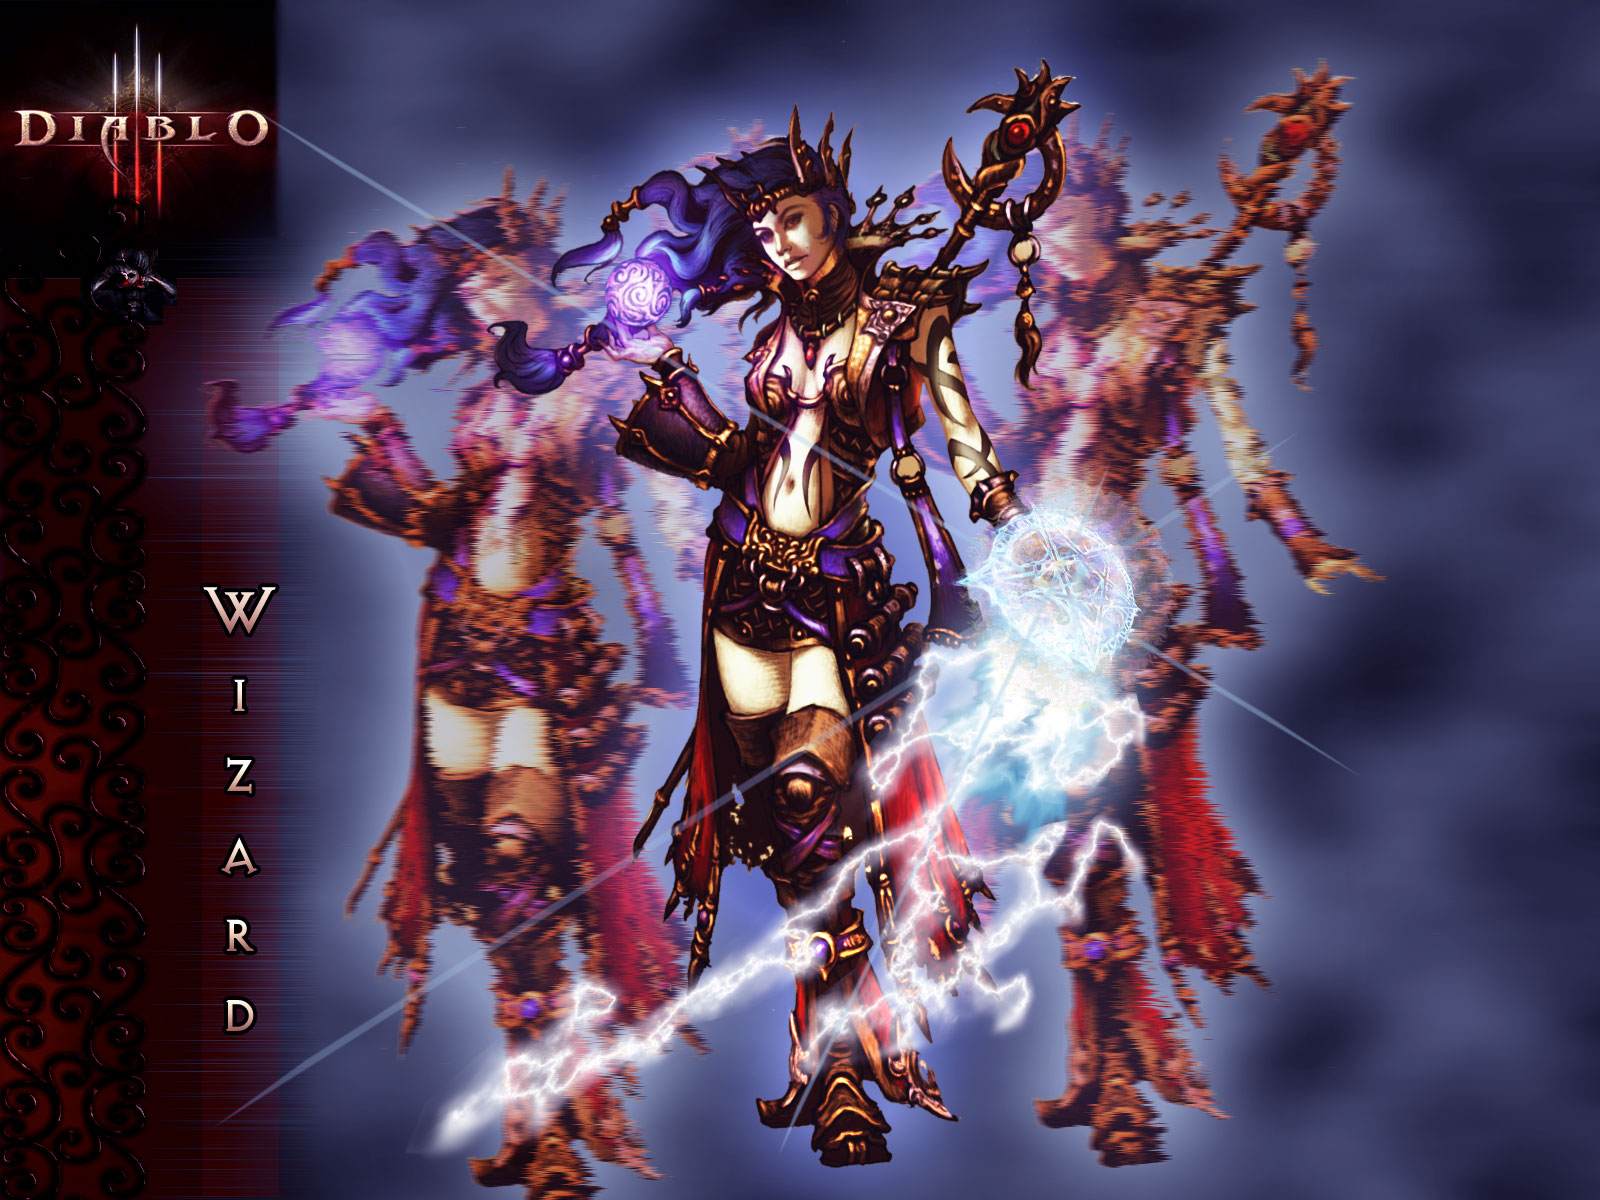 Diablo 3 wizard female naked anime image